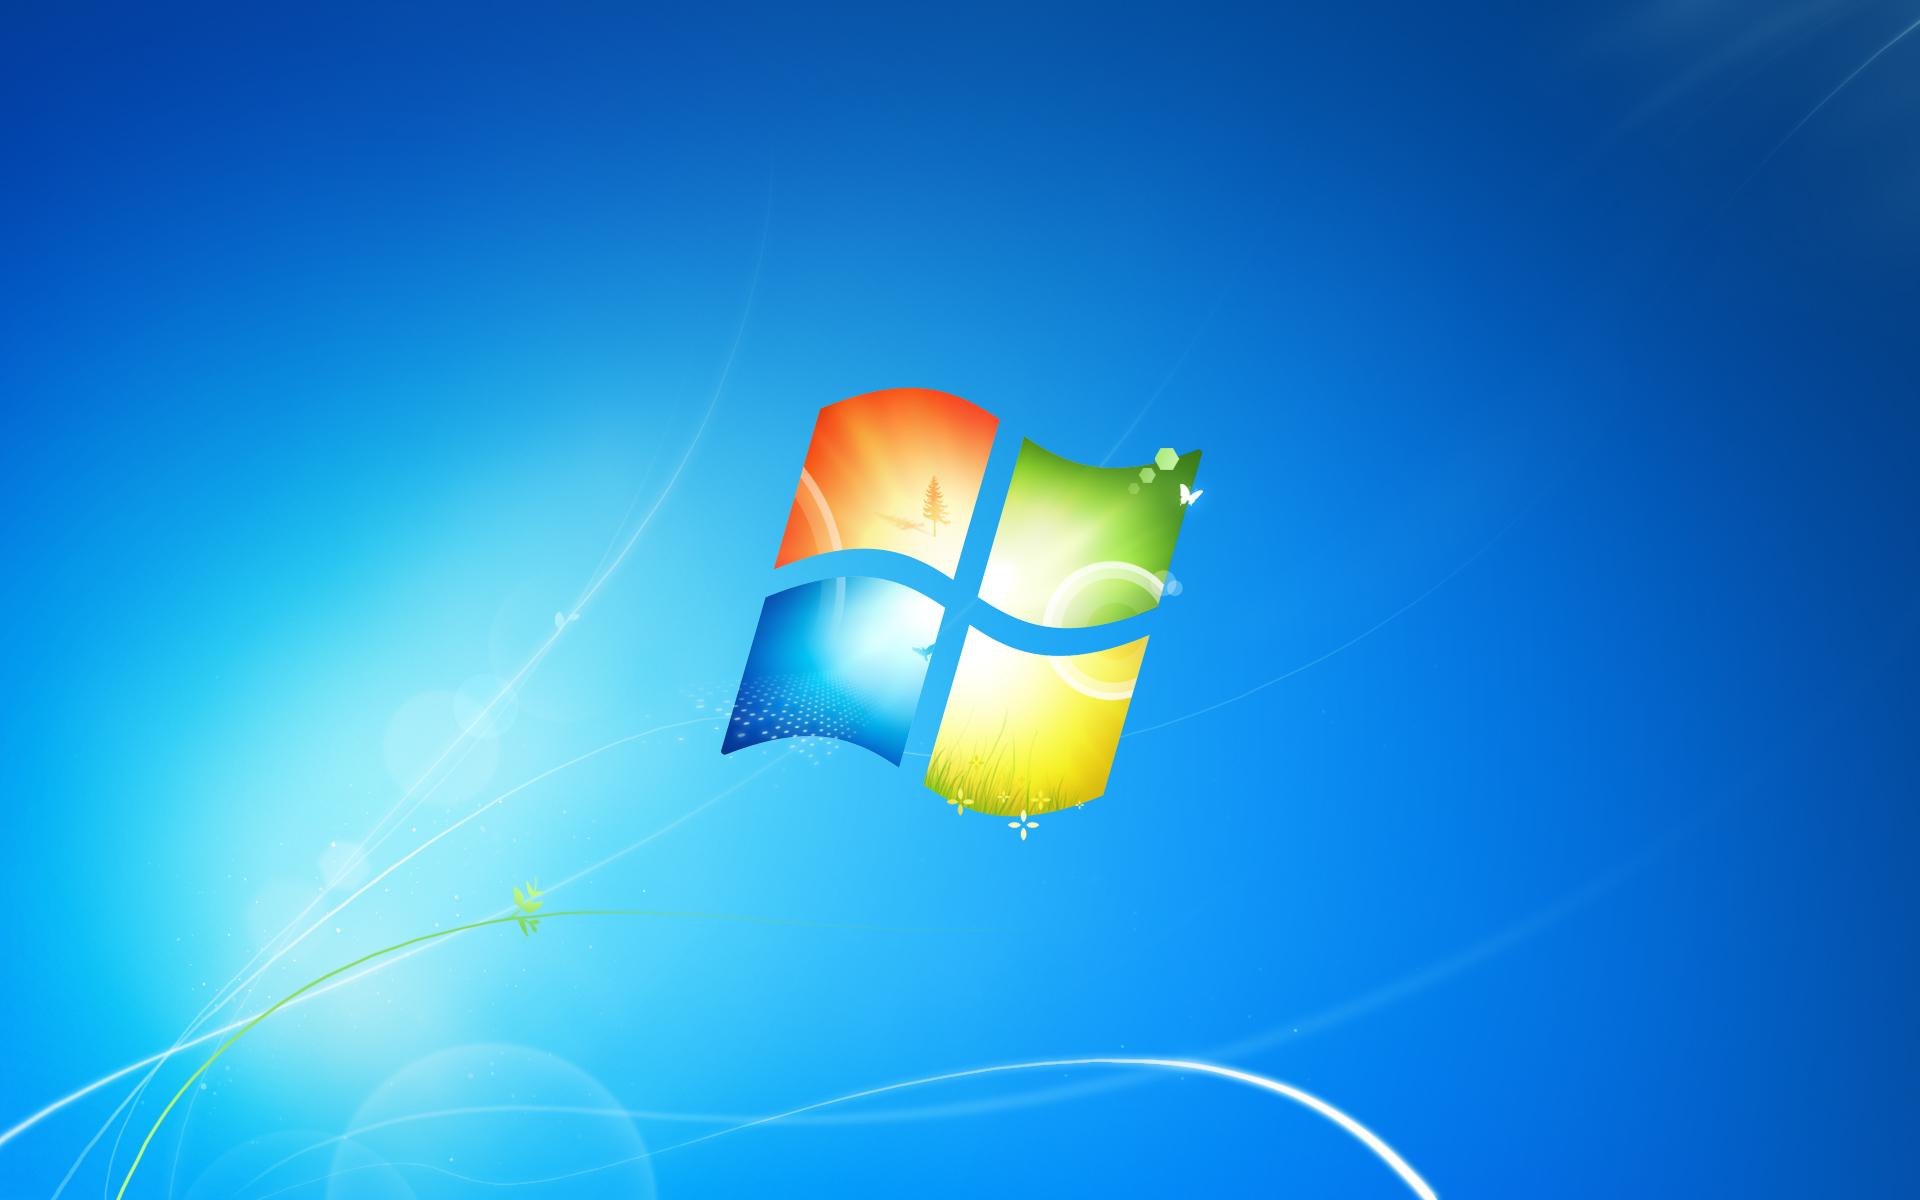 Askdavetaylor Wp Content Uploads 2018 10 Windows 7 Wallpaper